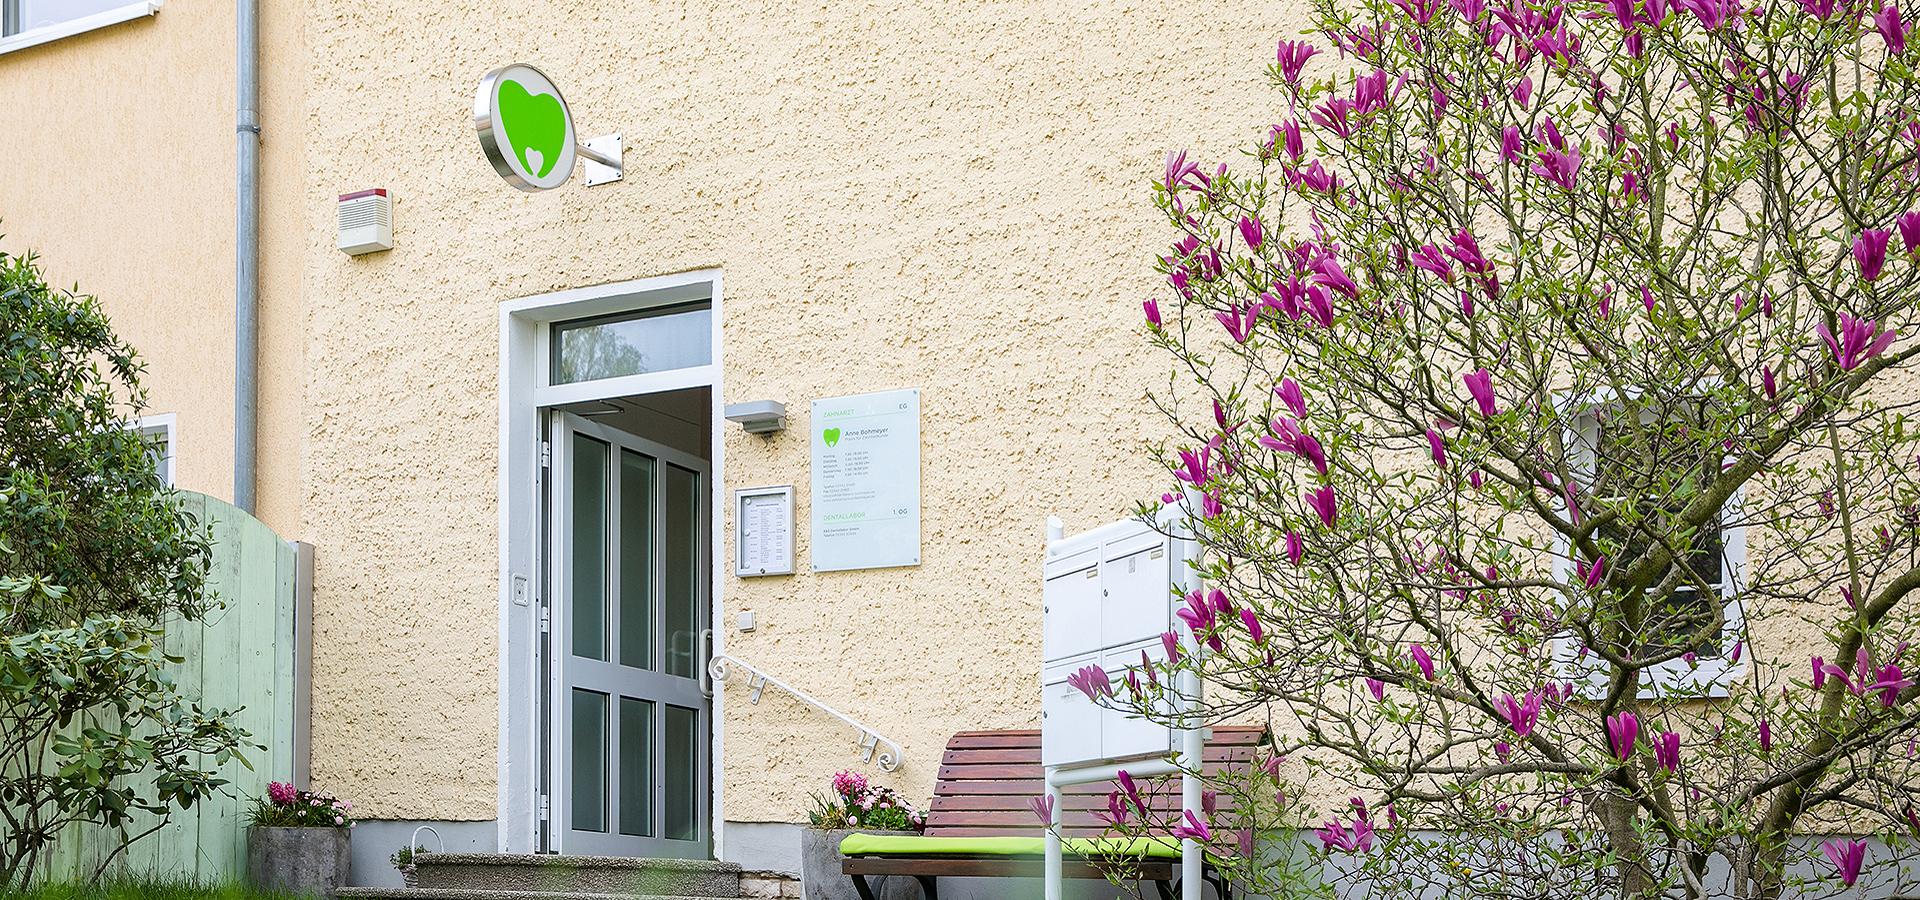 Zahnarztpraxis in Neuenhagen